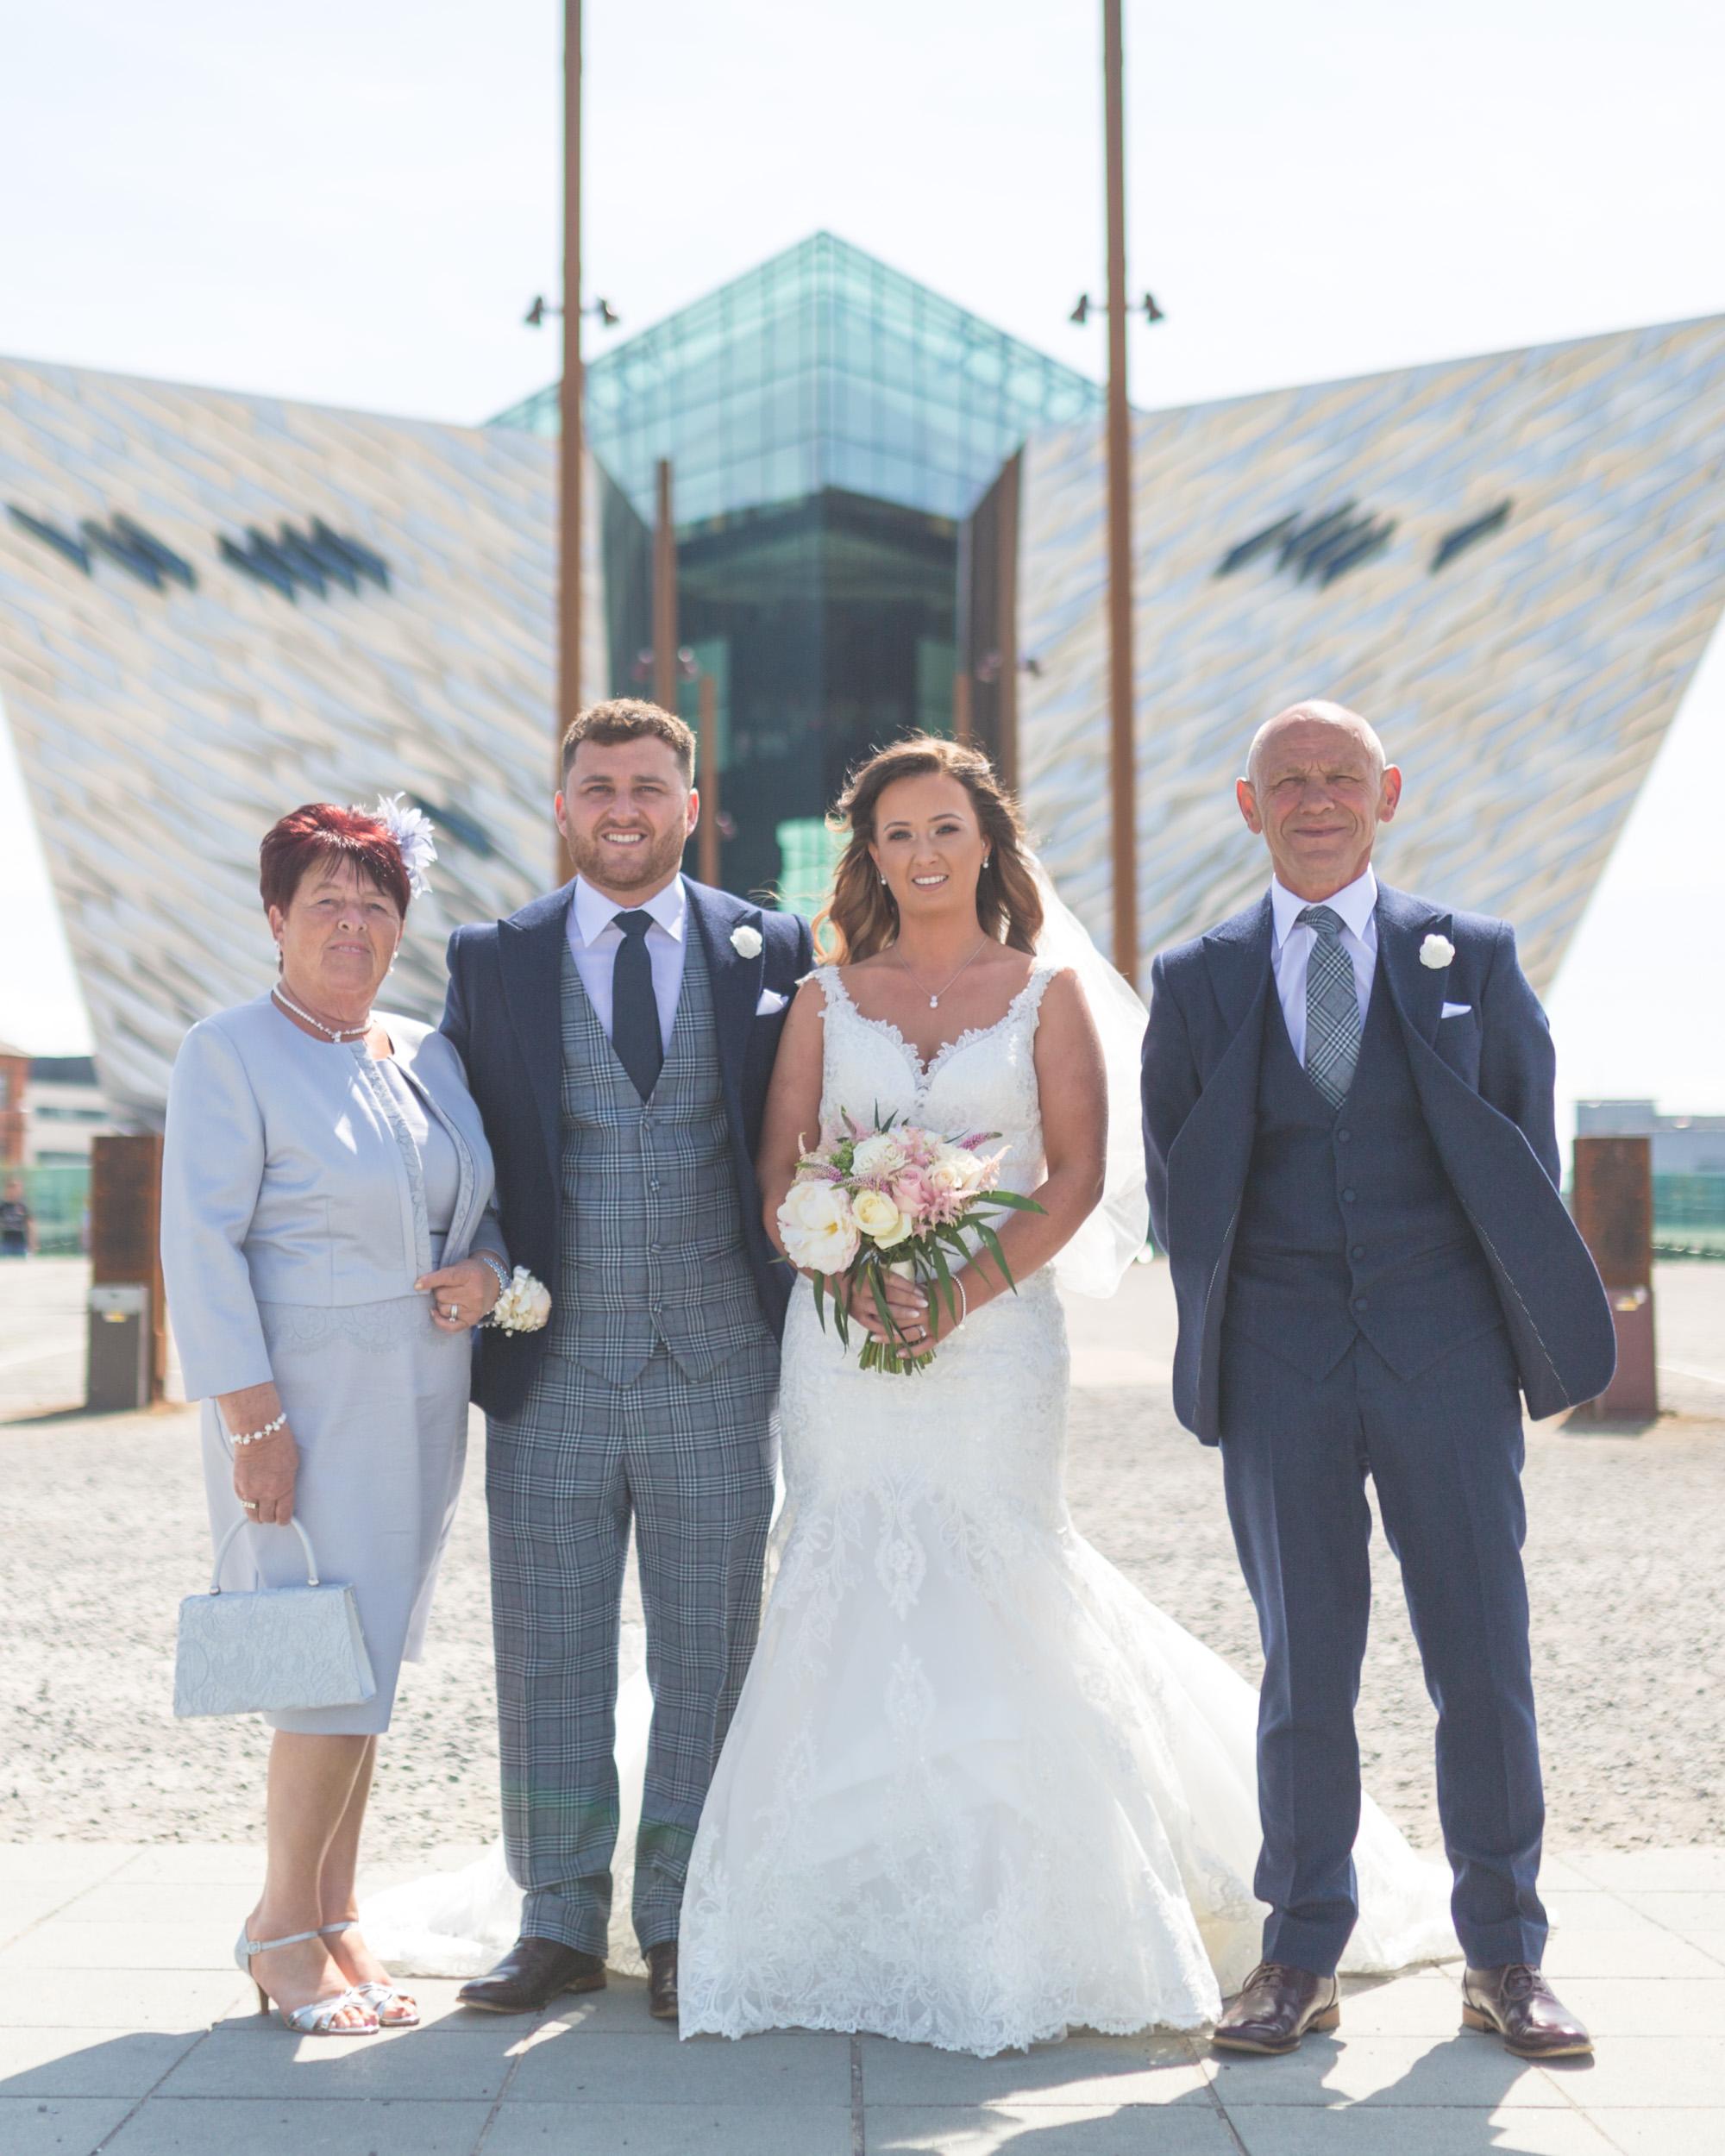 Brian McEwan   Northern Ireland Wedding Photographer   Rebecca & Michael   Portraits-27.jpg